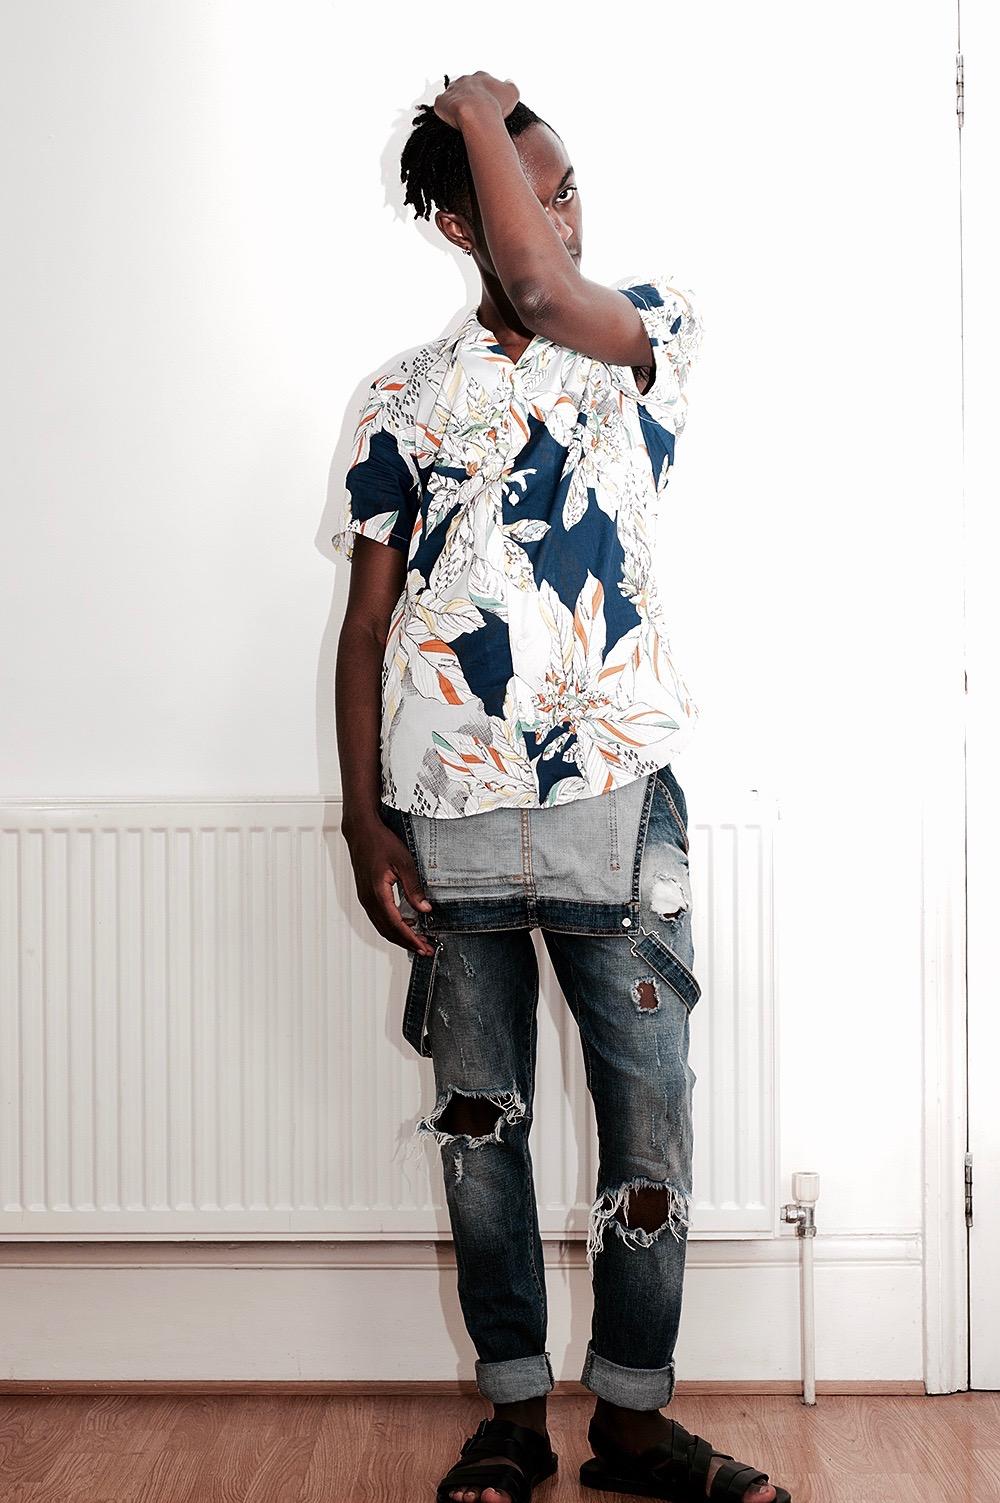 blogger, male blogger, fashion blogger, gay blogger, black blogger, locs, fashion, menswear, florals, Liberty x Topman